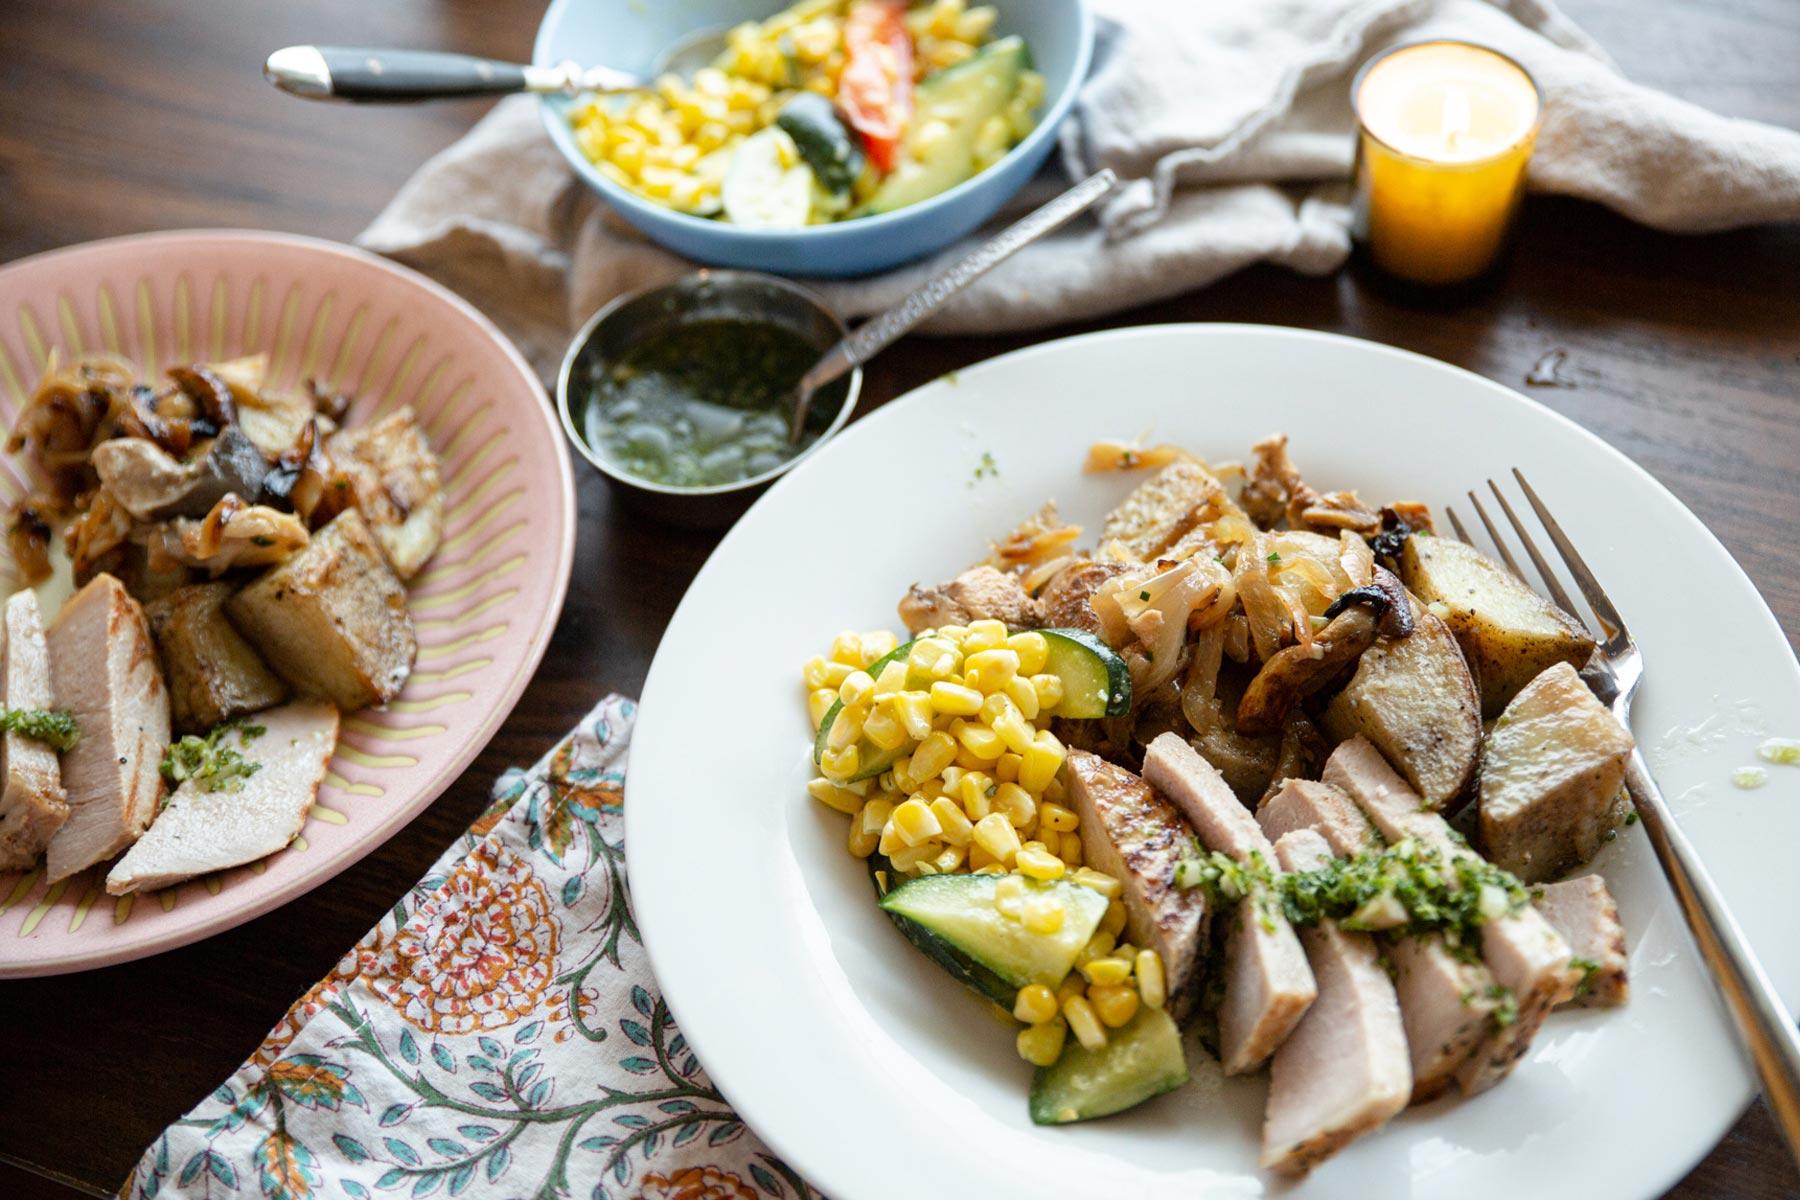 Pork with corn, cucumbers, and potates